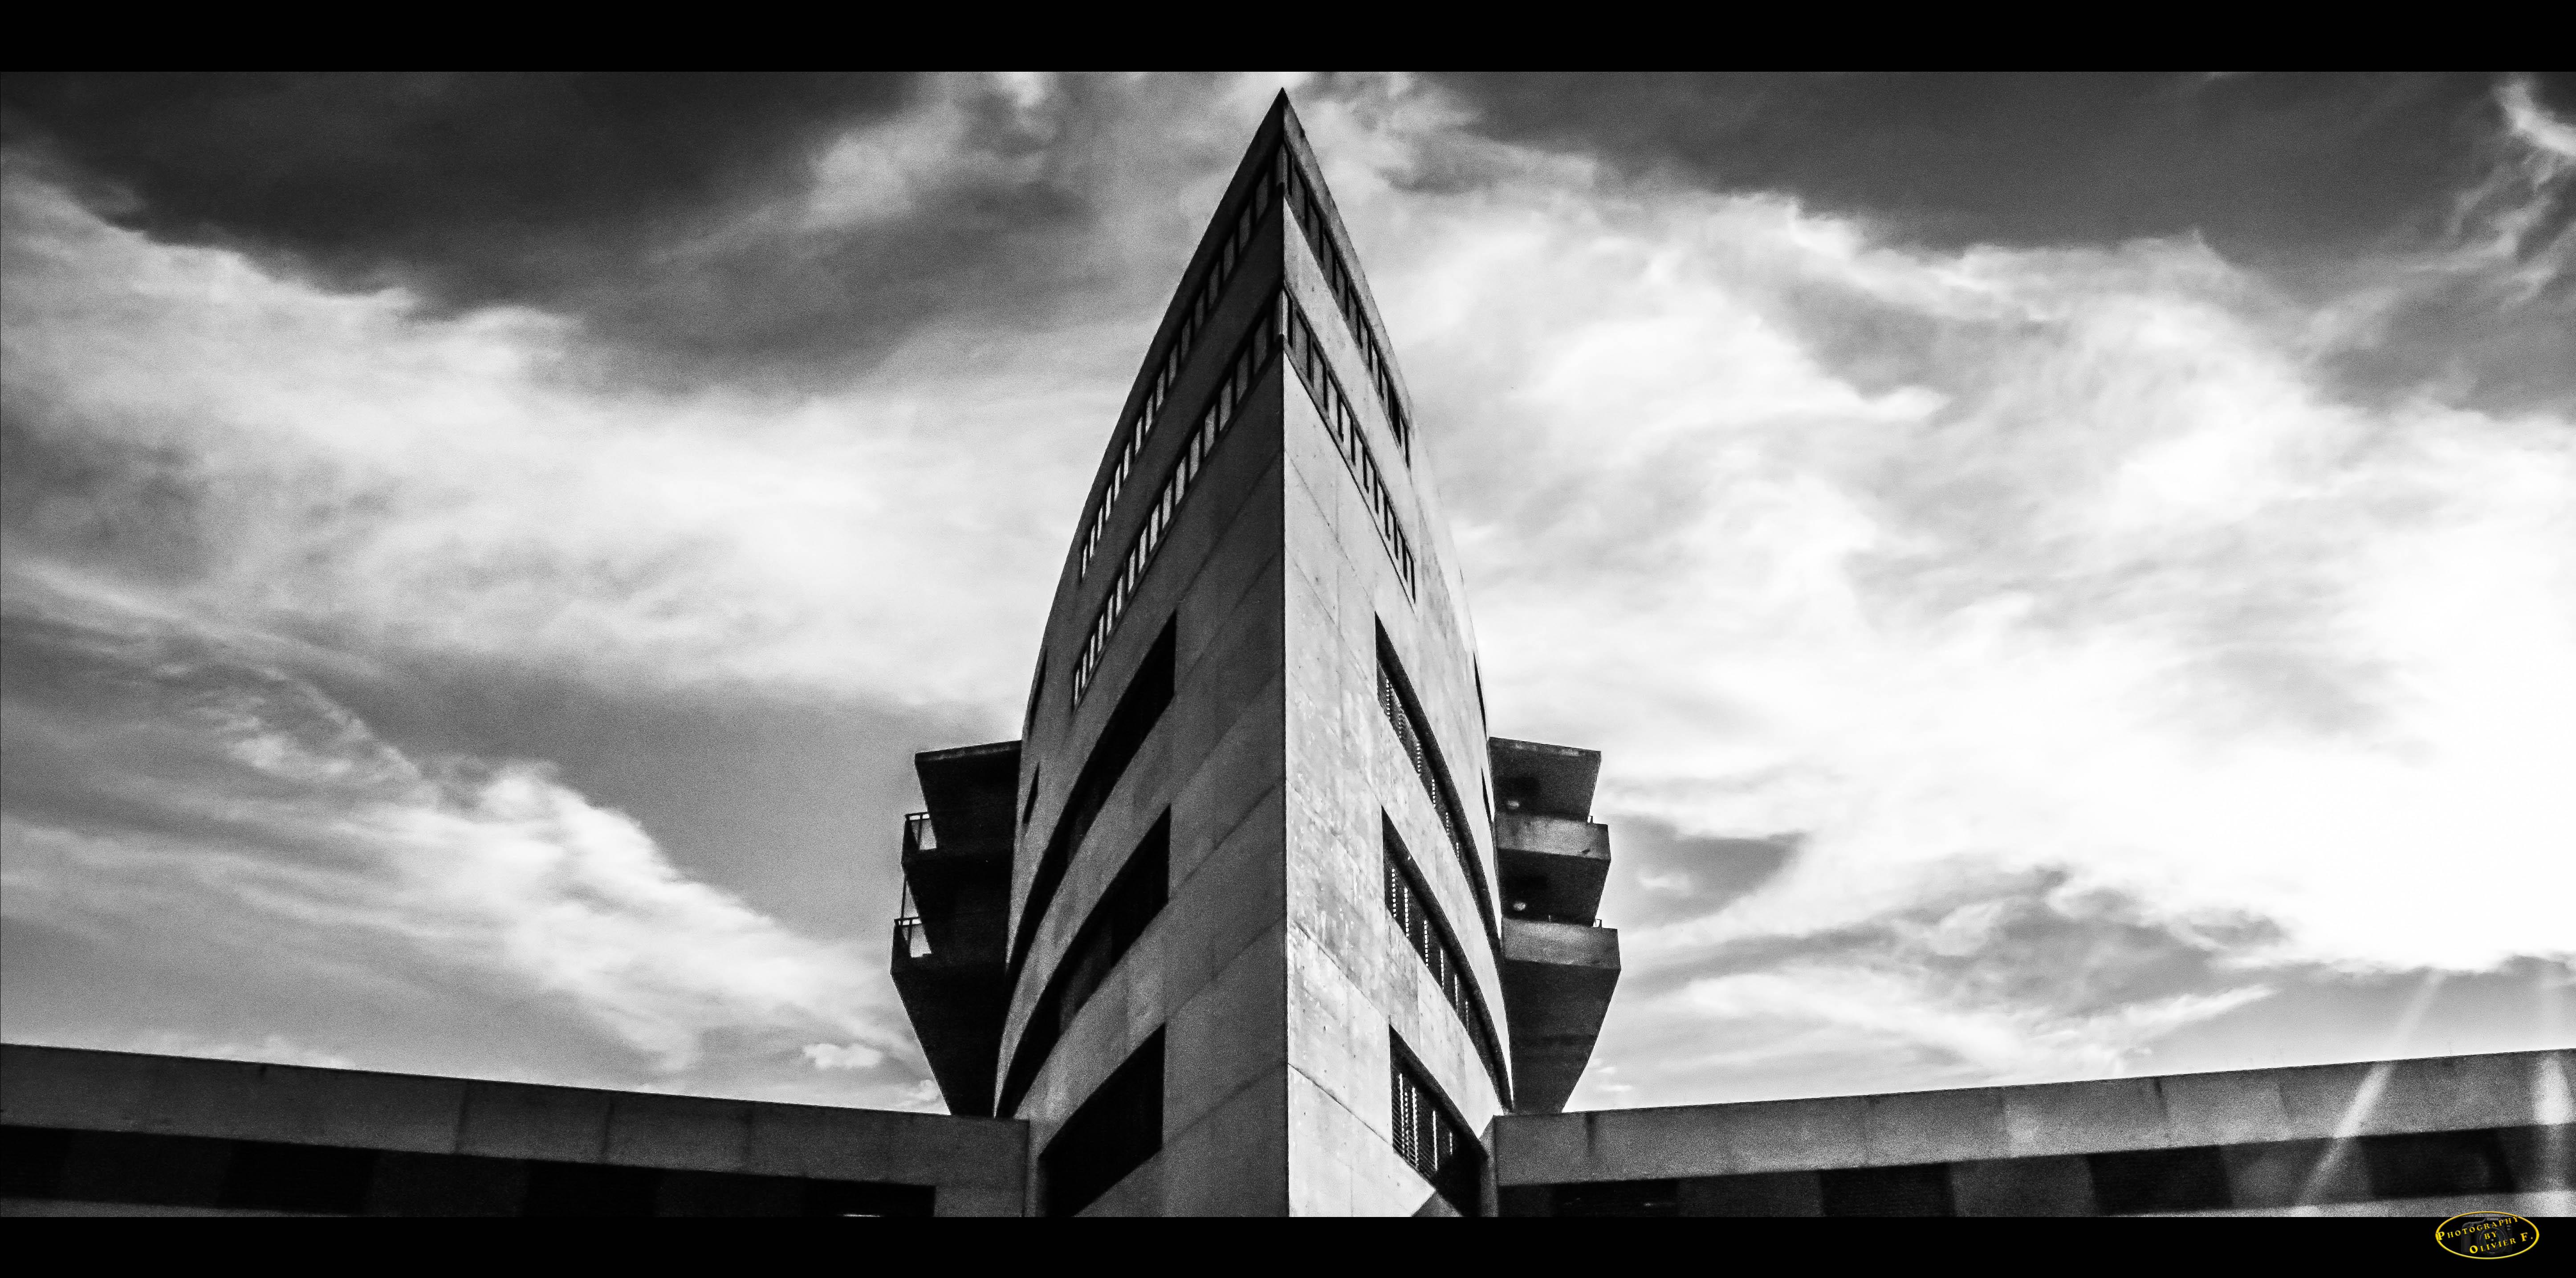 Ship concrete